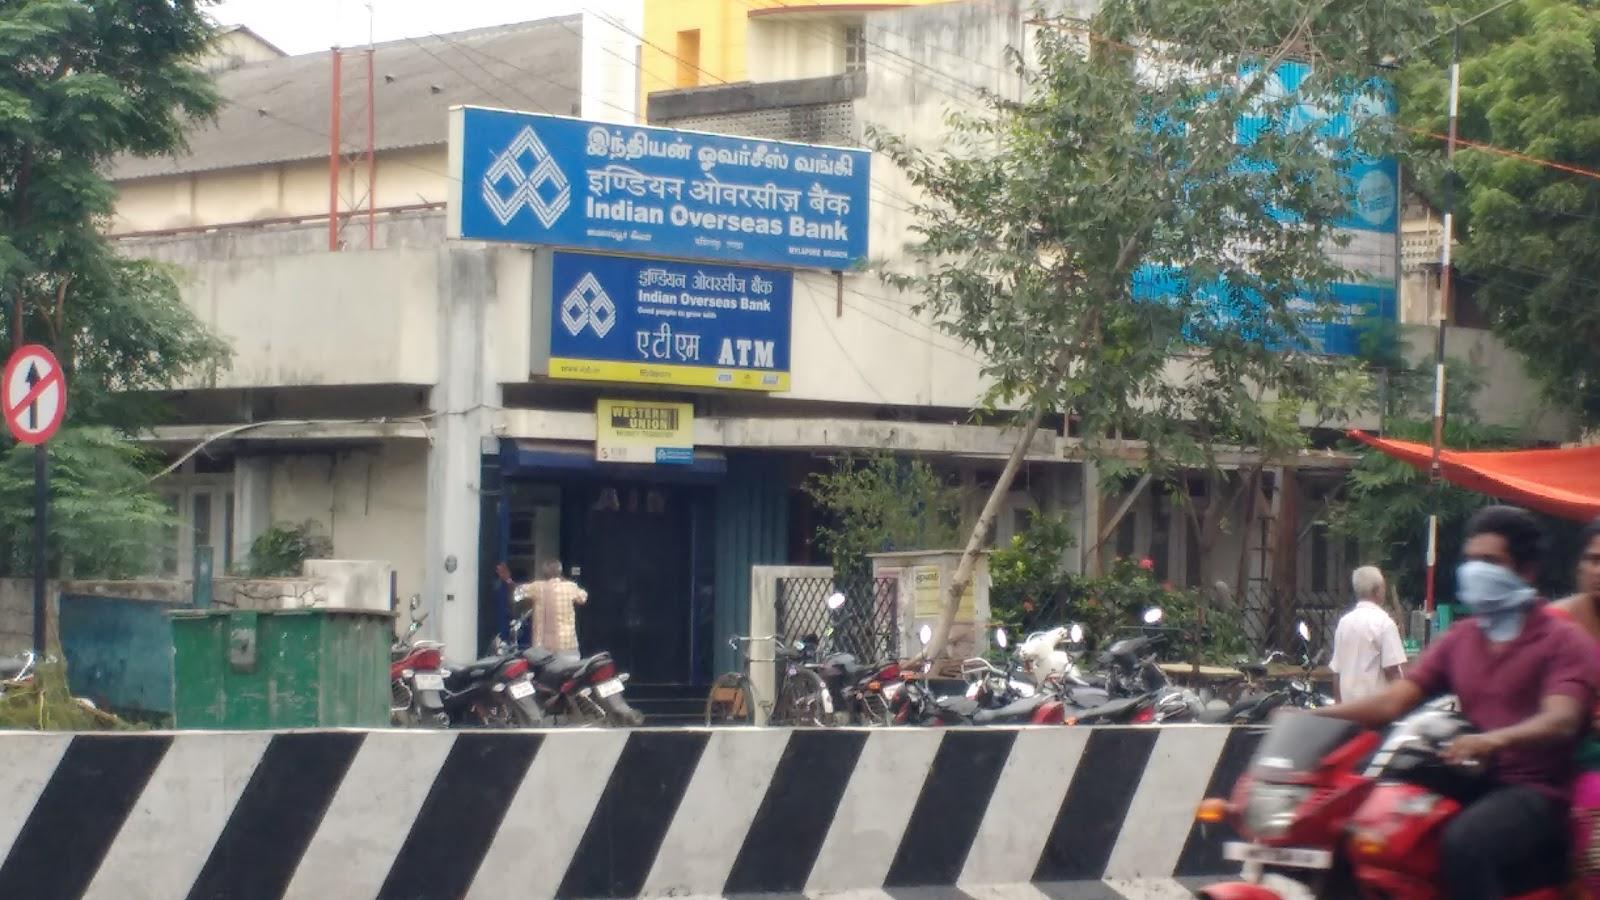 blood bank Indian Overseas Bank near Chennai Tamil Nadu